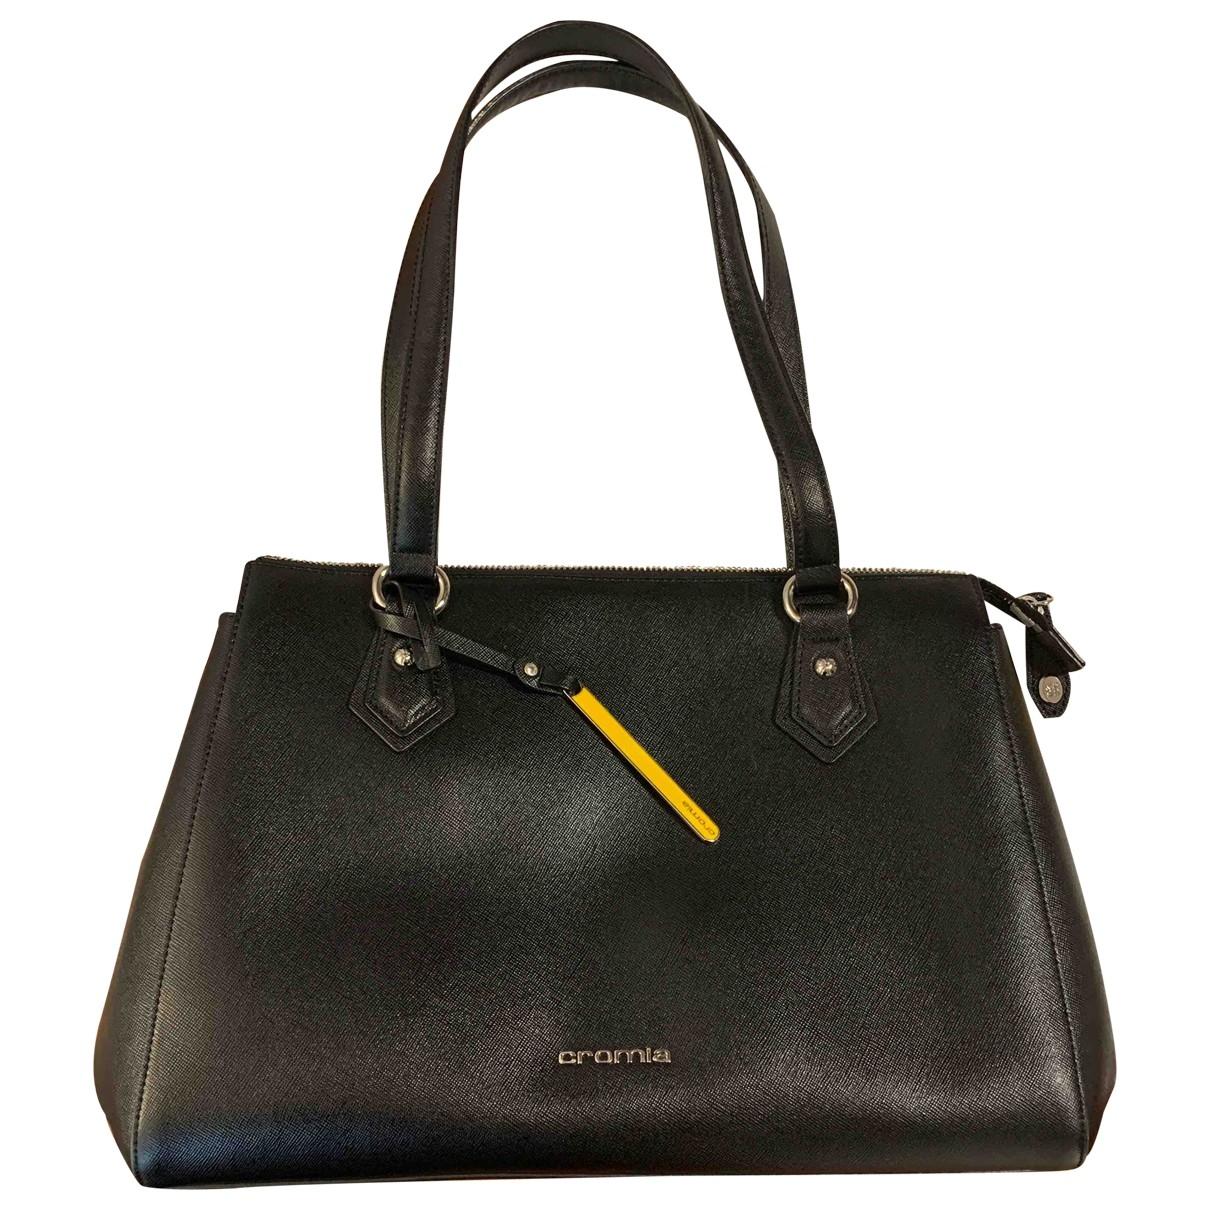 Cromia \N Handtasche in  Schwarz Leder